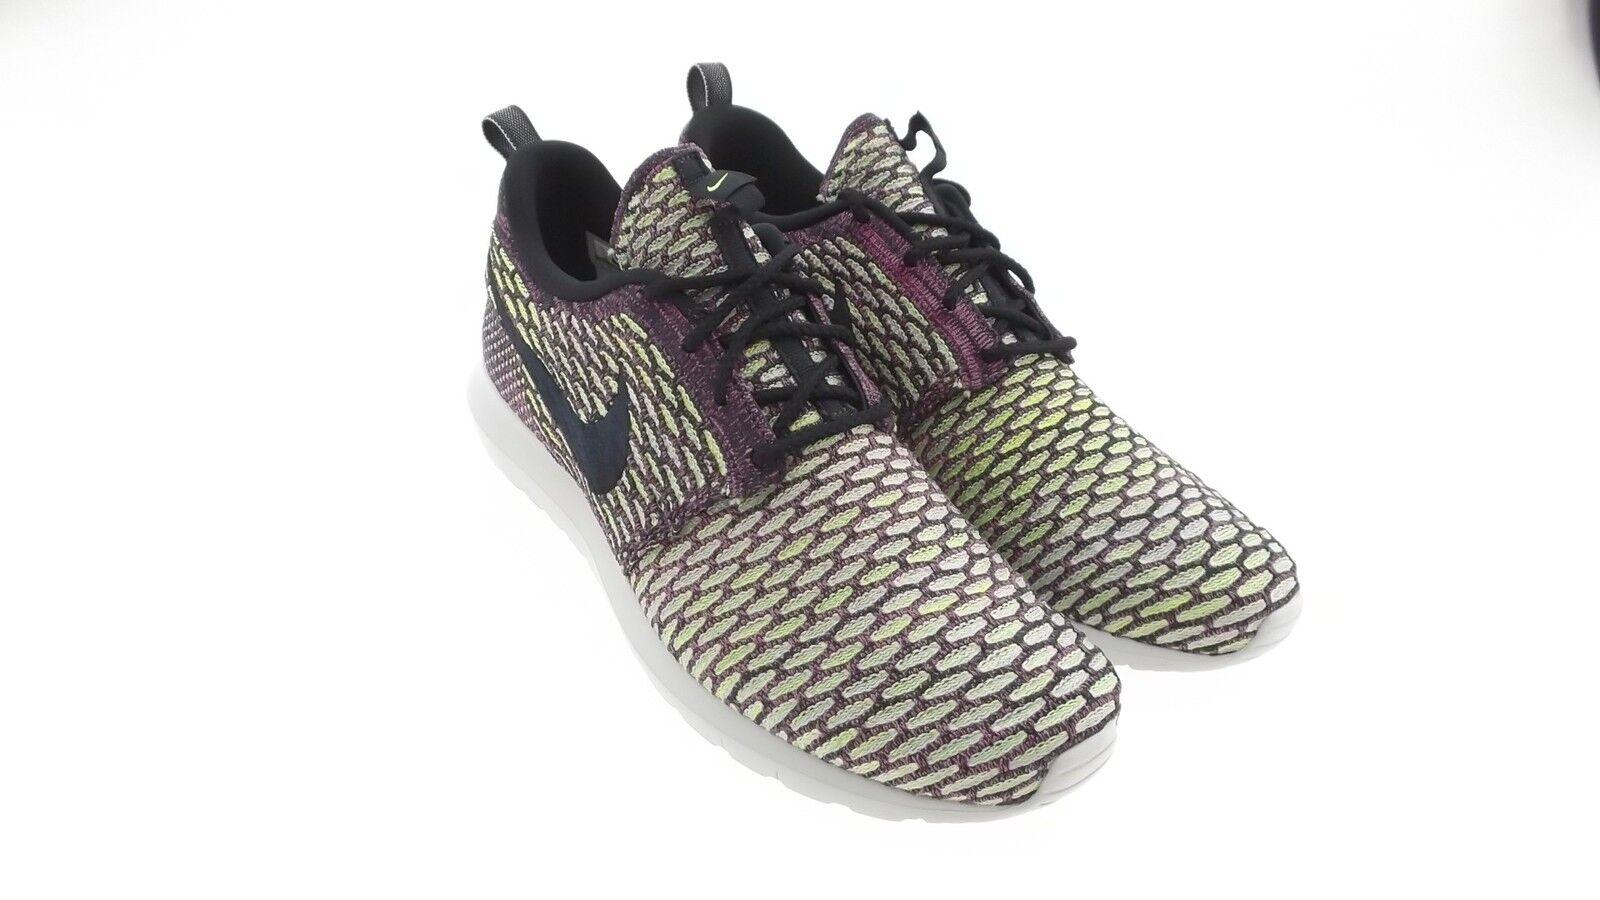 677243-400 Nike Hommes Flyknit Roshe Run neon purple